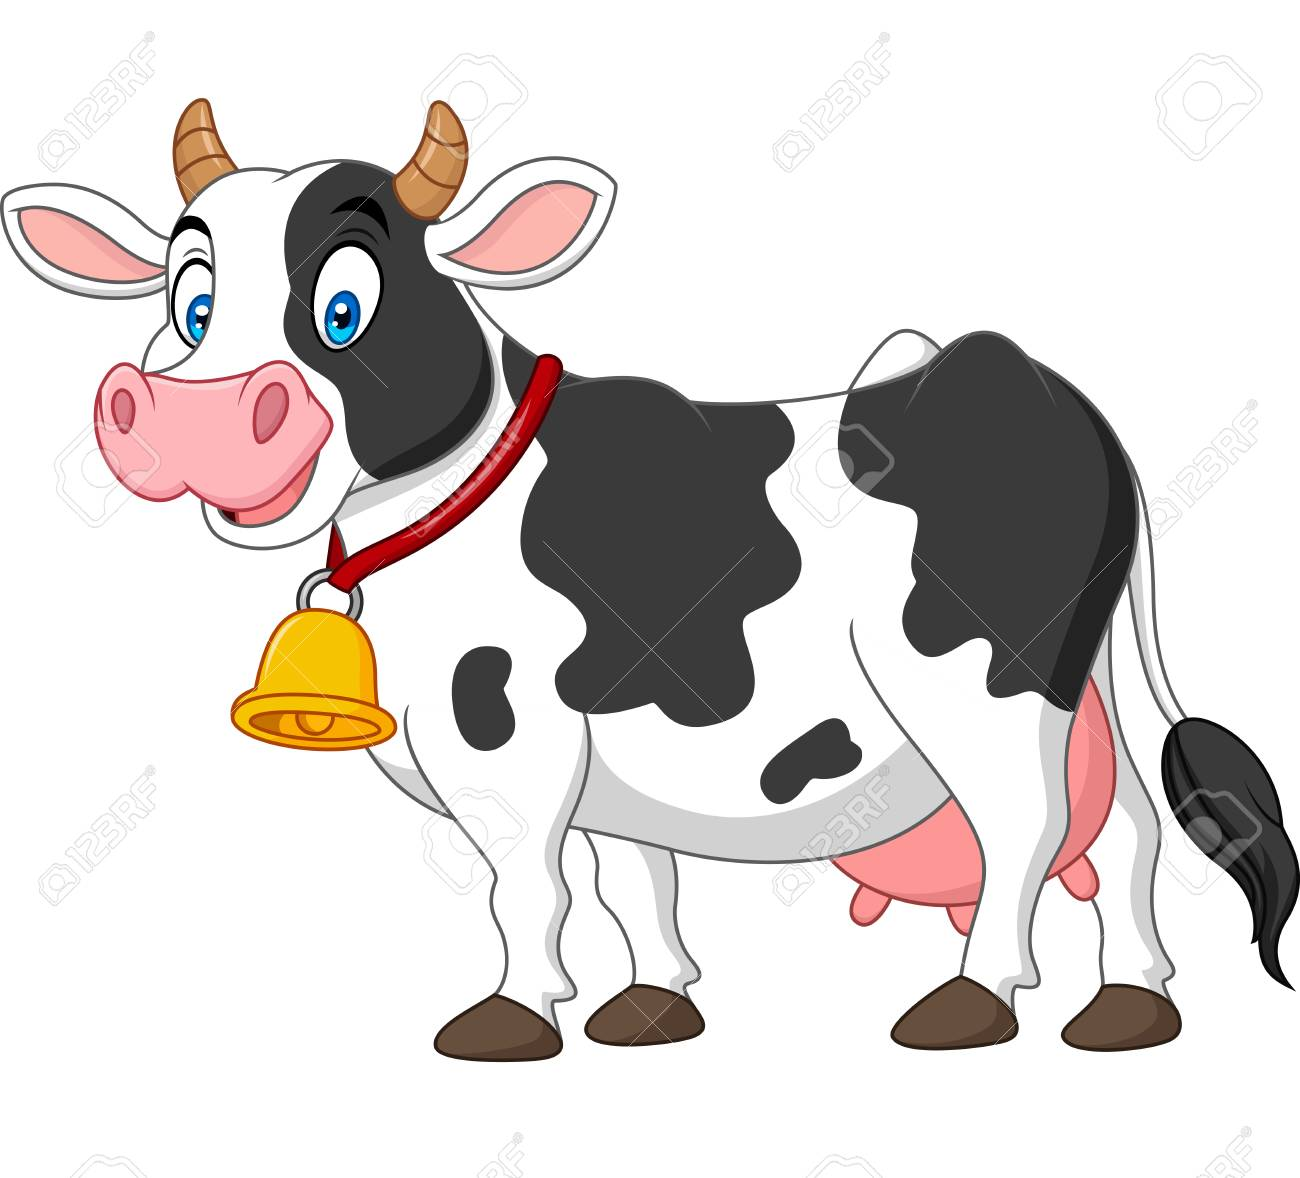 Cartoon happy cow - 102626644